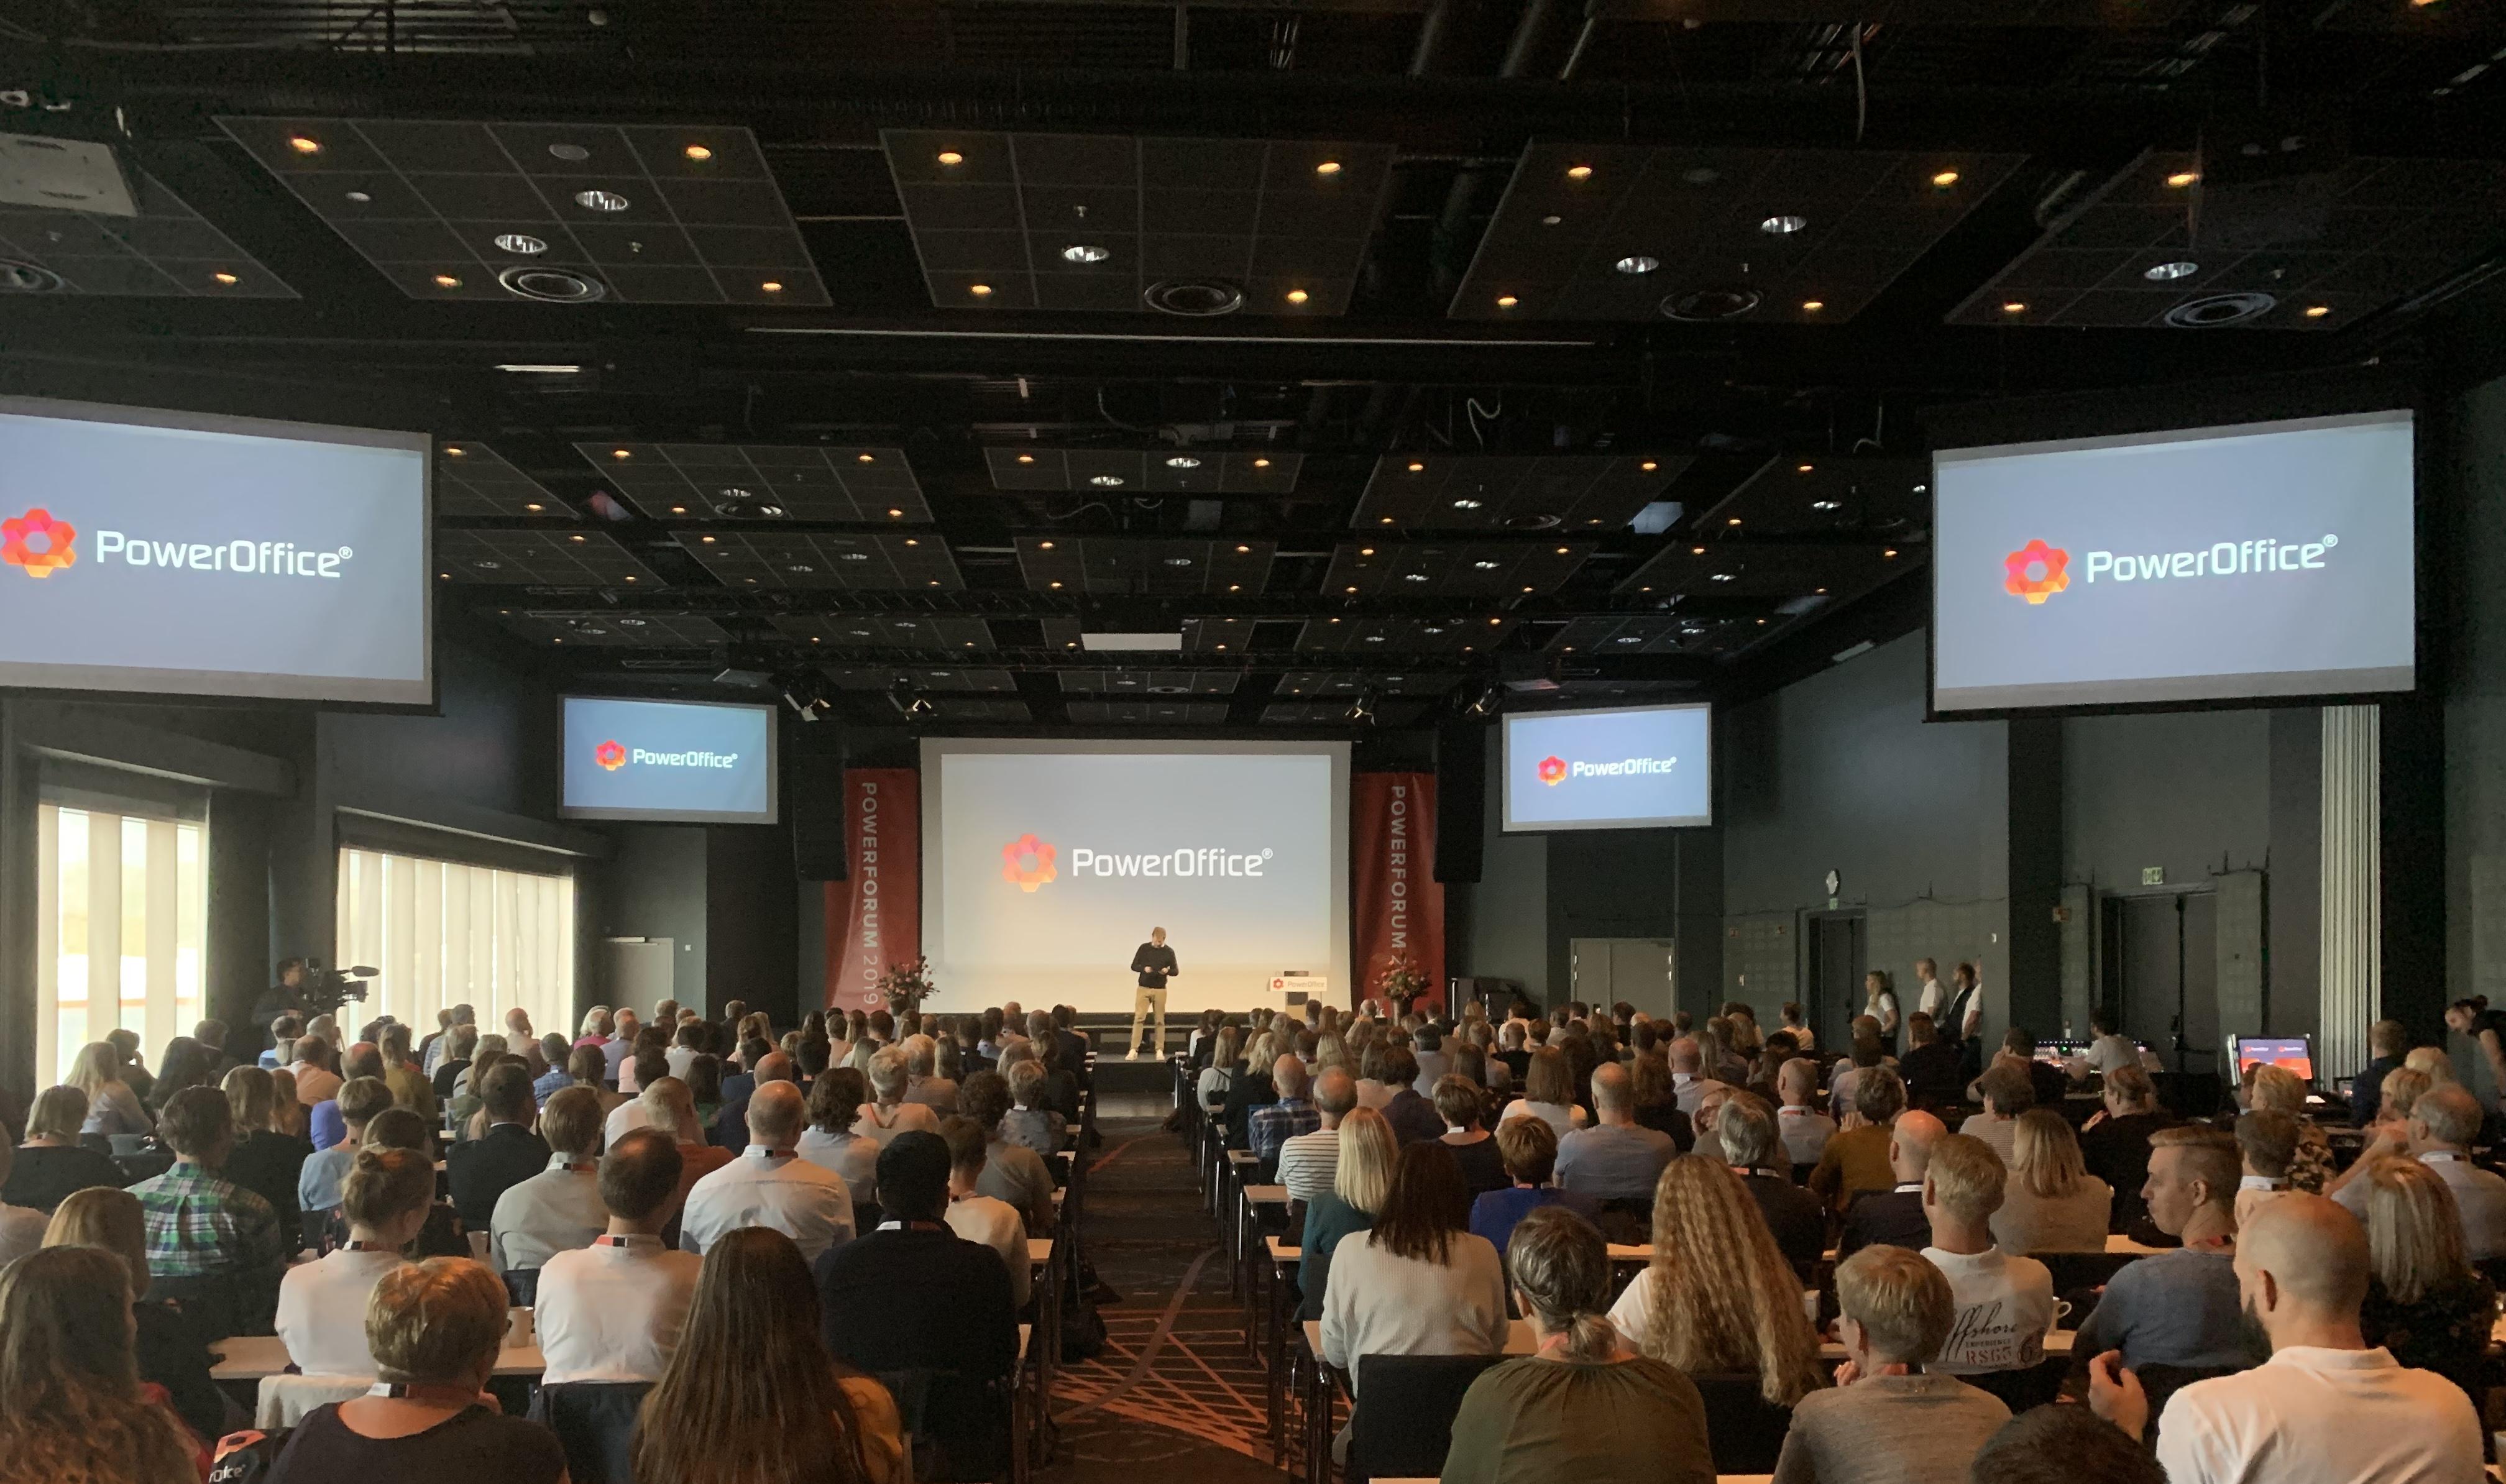 CostTracker på Poweroffice sitt årlige Powerforum